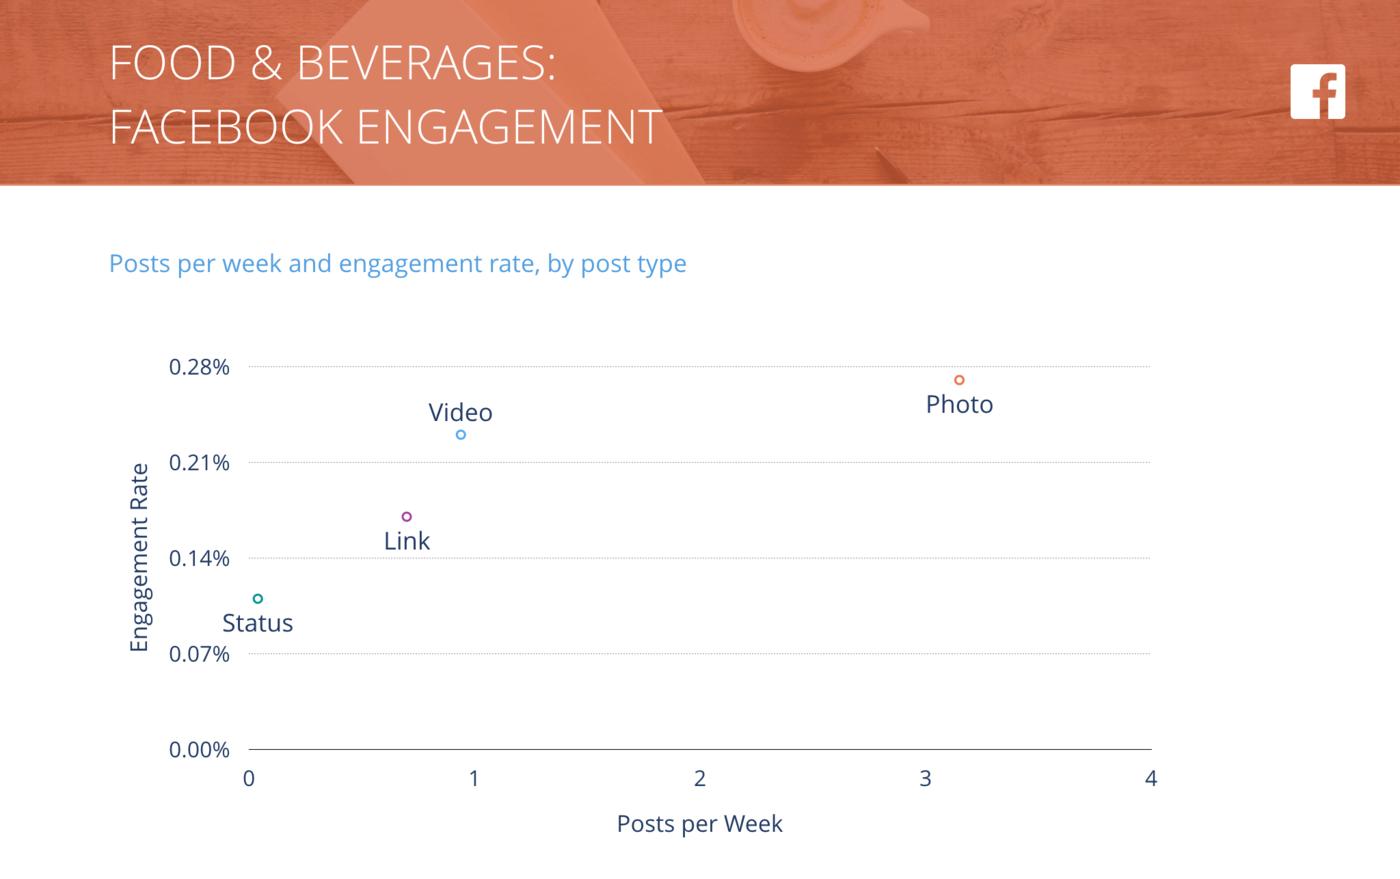 slide of Facebook Posts per Week vs. Engagement Rate per Post, Food & Beverages